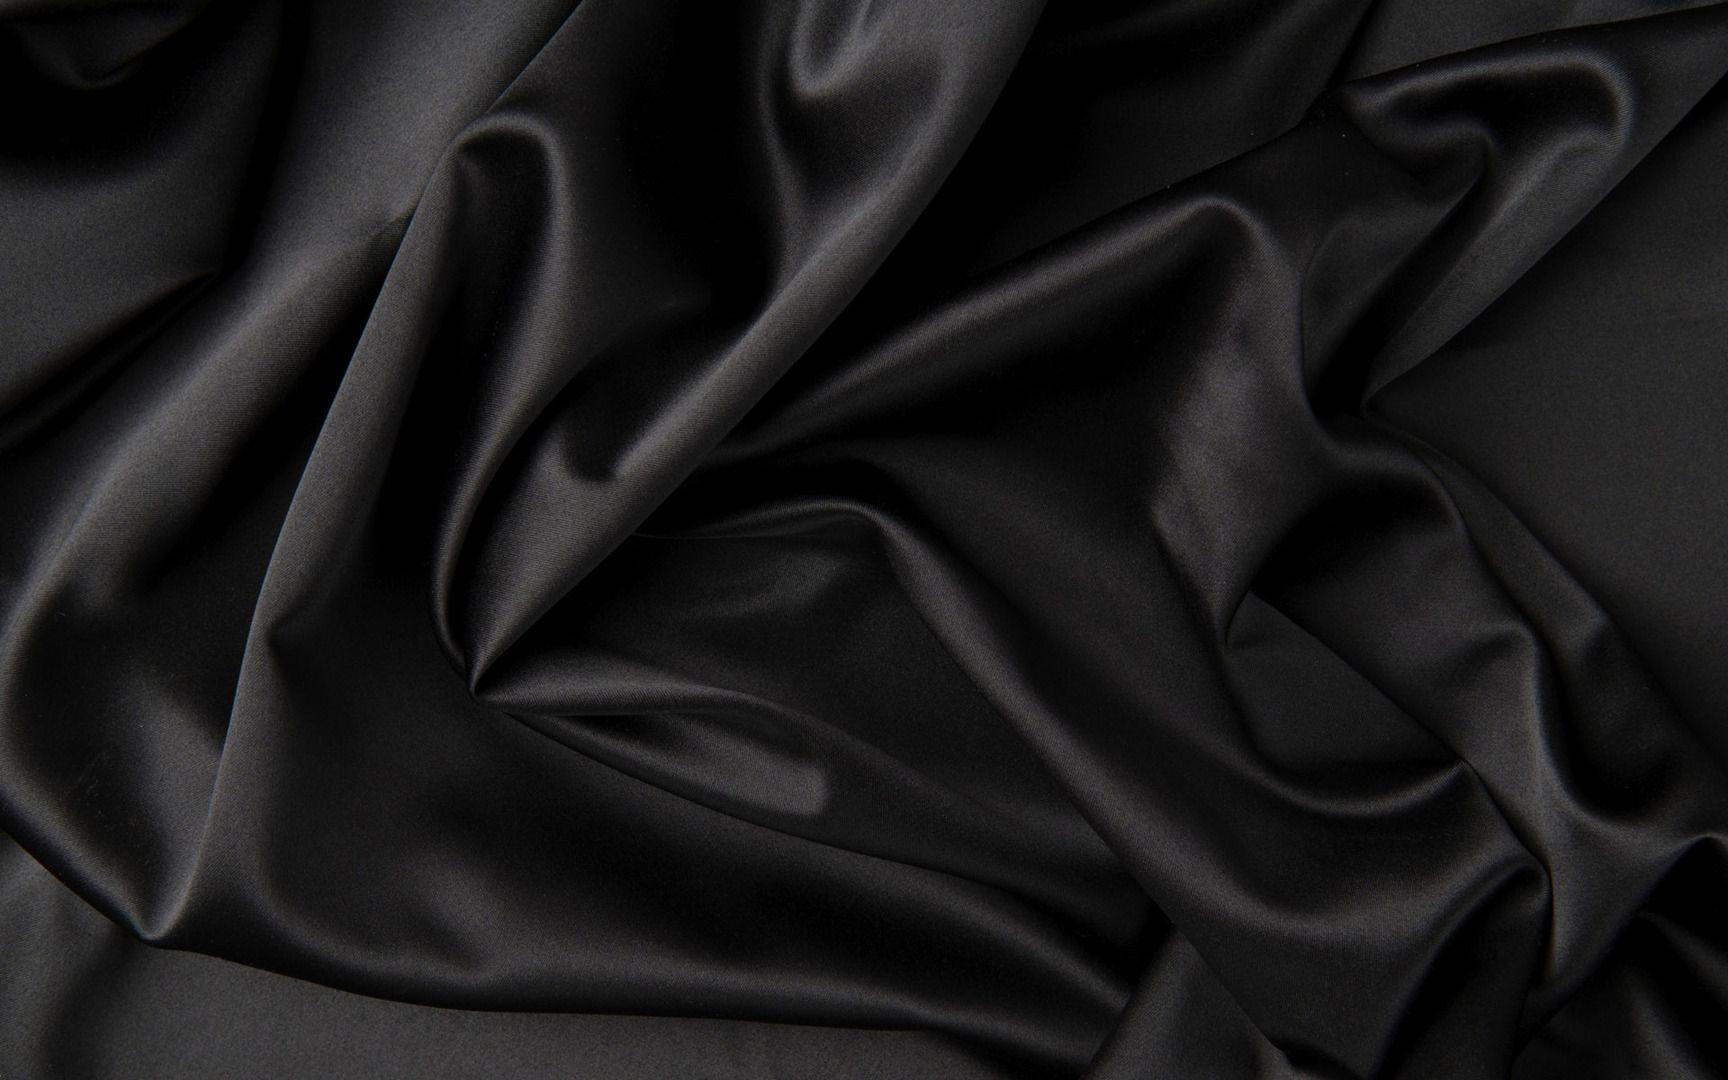 Black Silk Wallpaper Black Textured Wallpaper Hd Backgrounds Black Silk